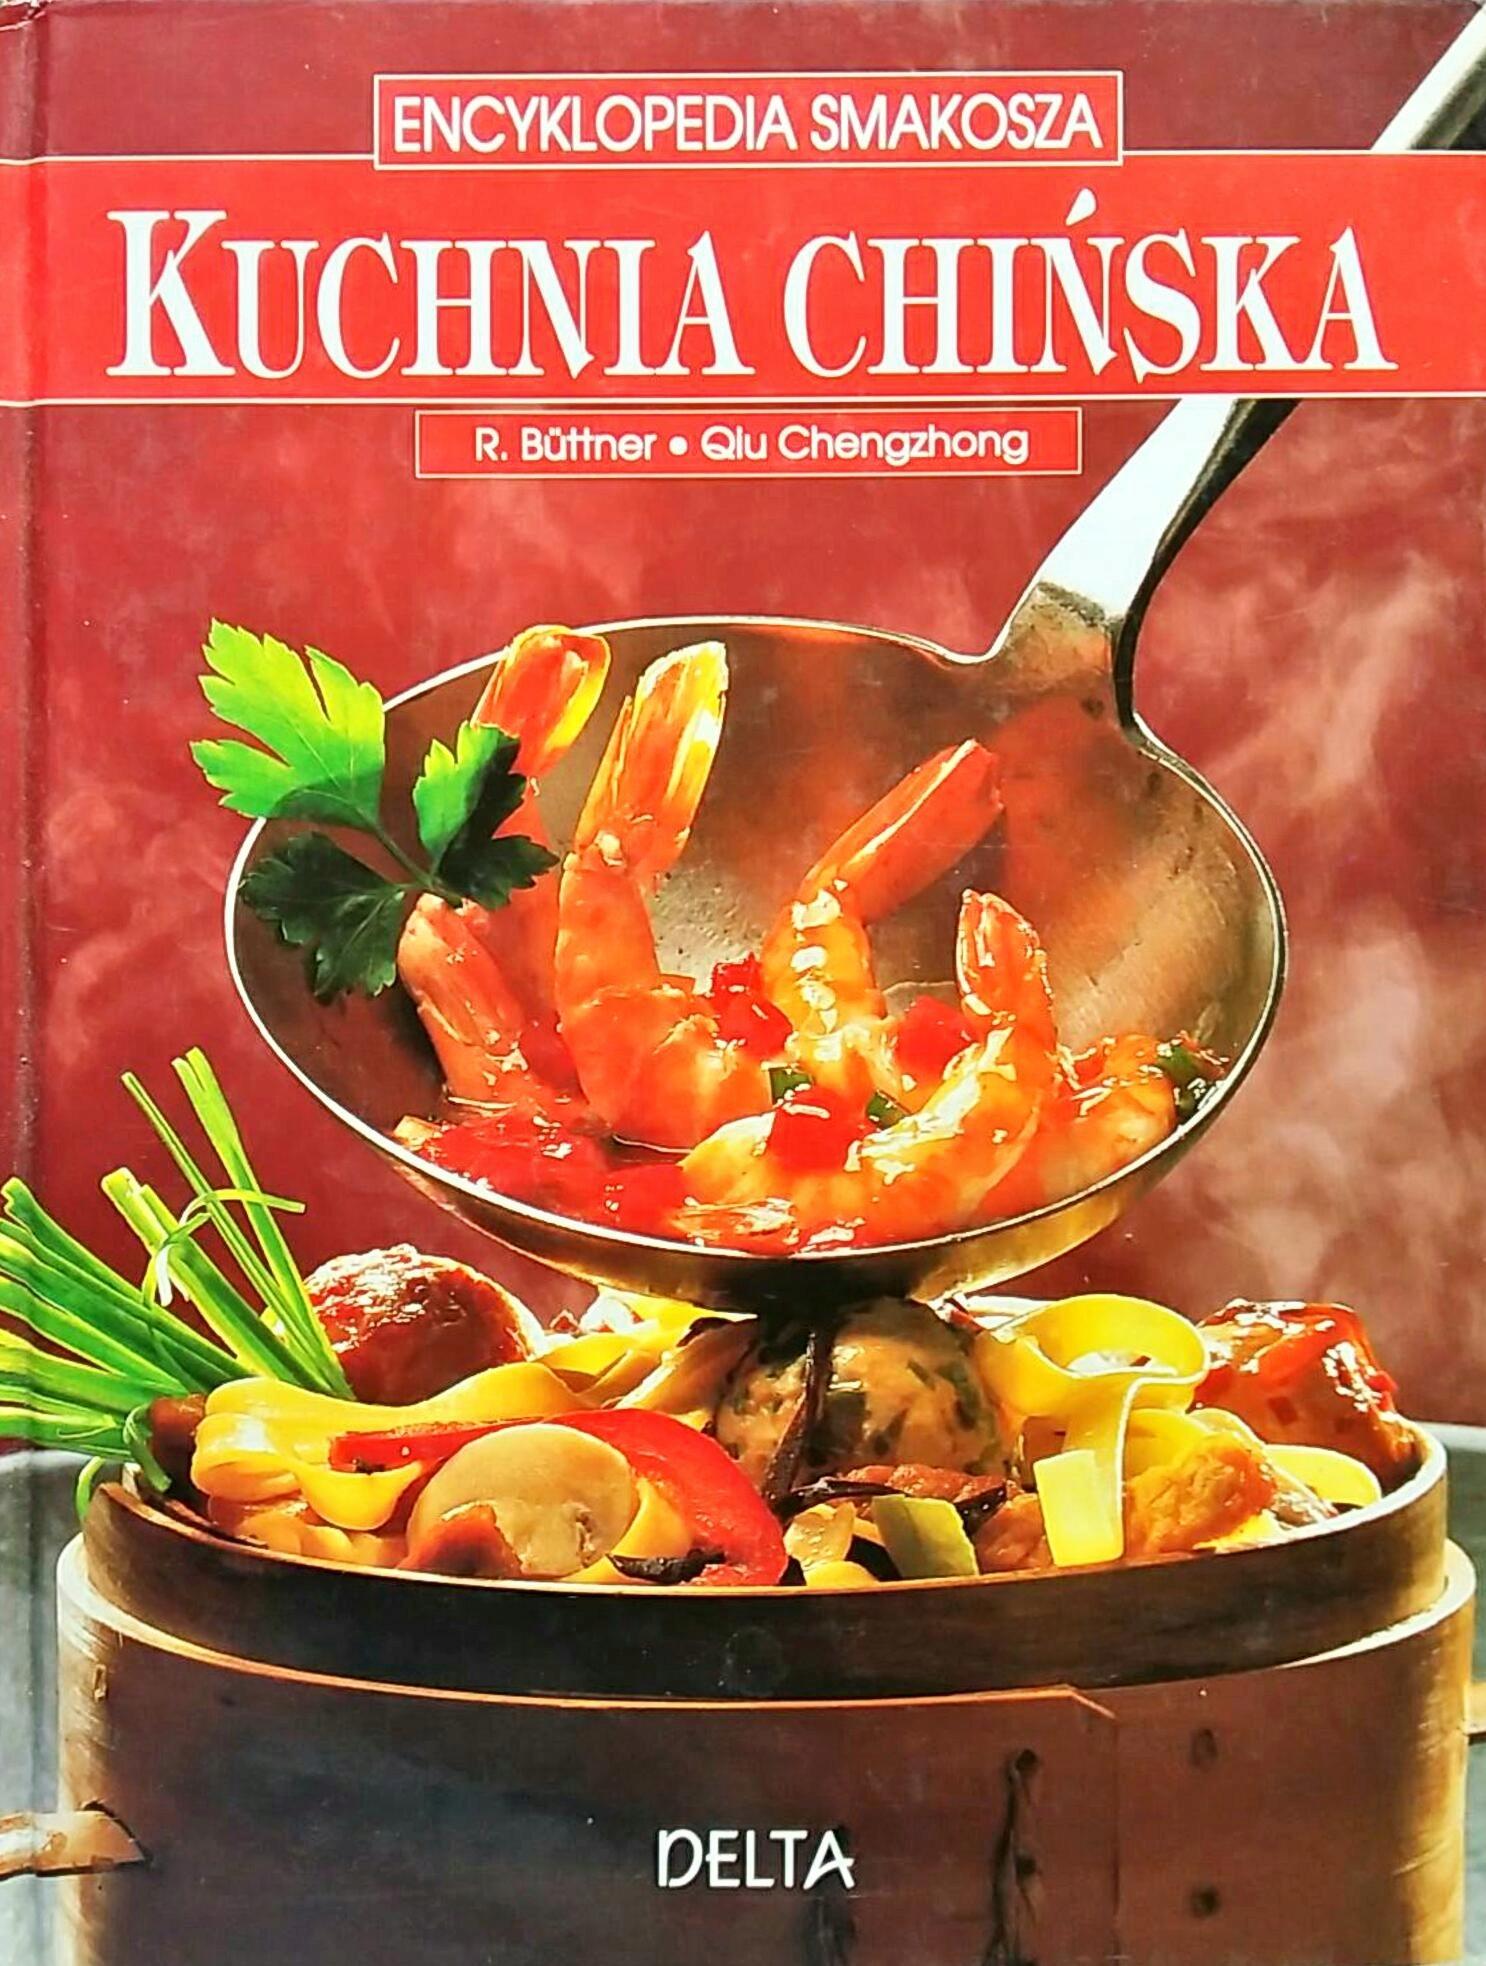 Kuchnia Chinska Encyklopedia Smakosza Buttner 7566095945